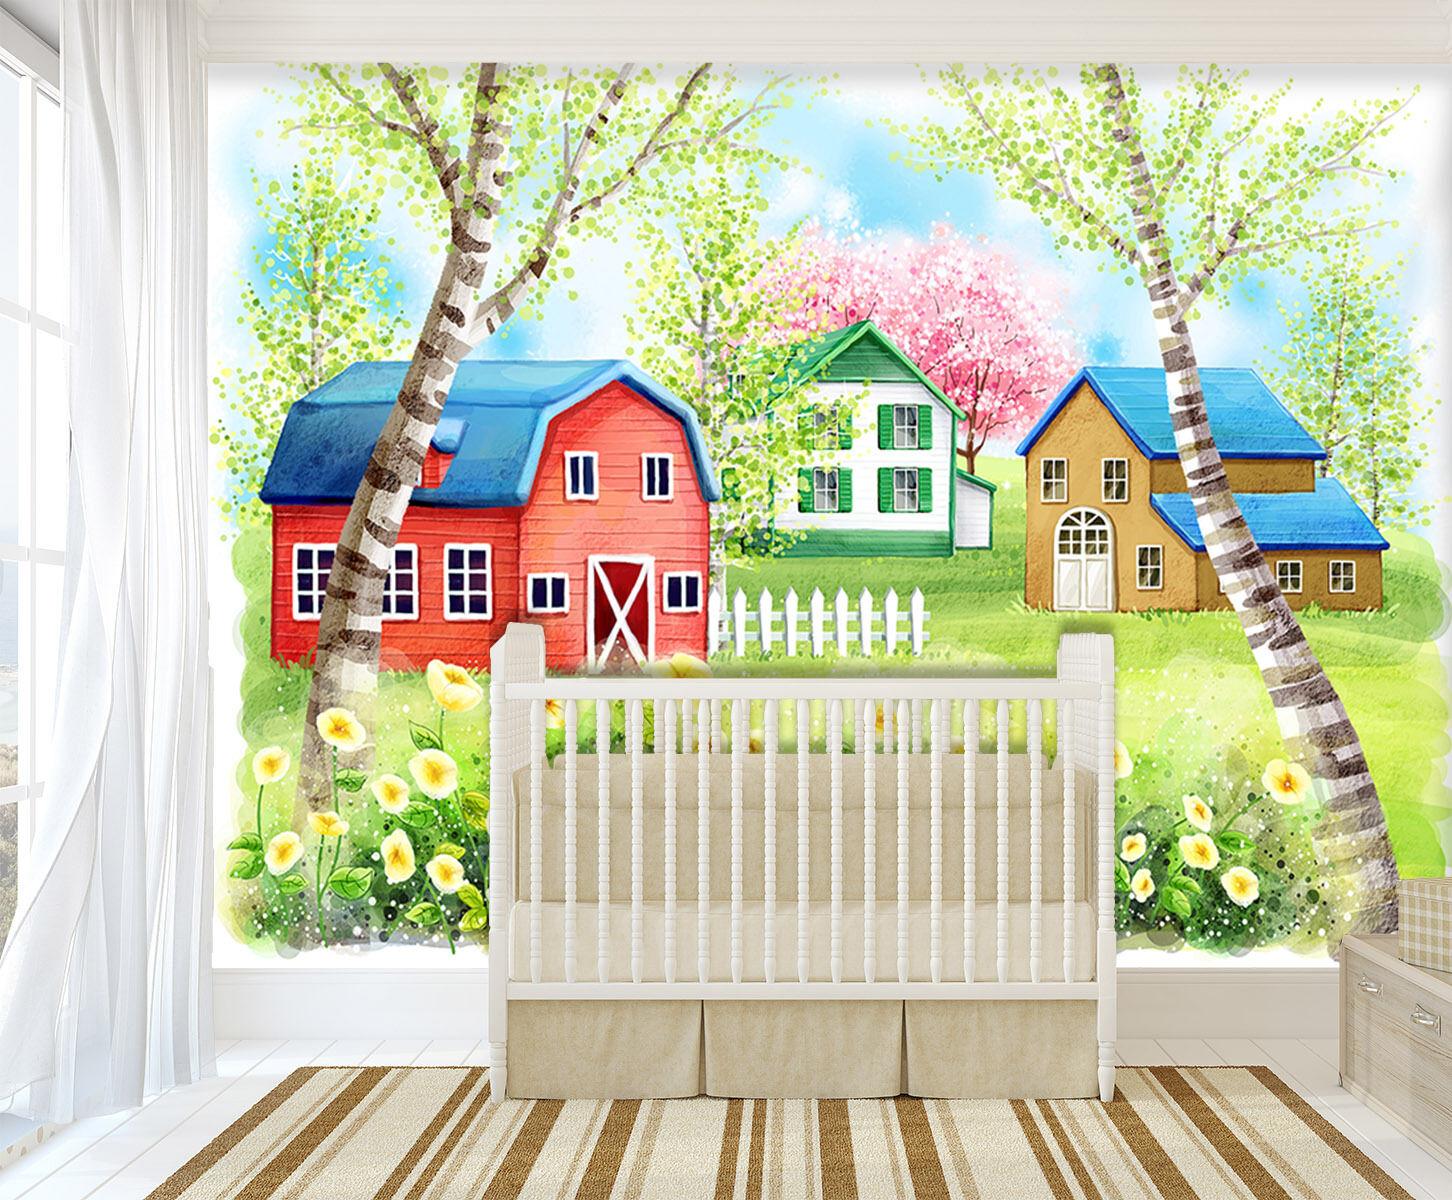 3D Farbige Häuser, Garten Fototapeten Wandbild Fototapete BildTapete Familie DE